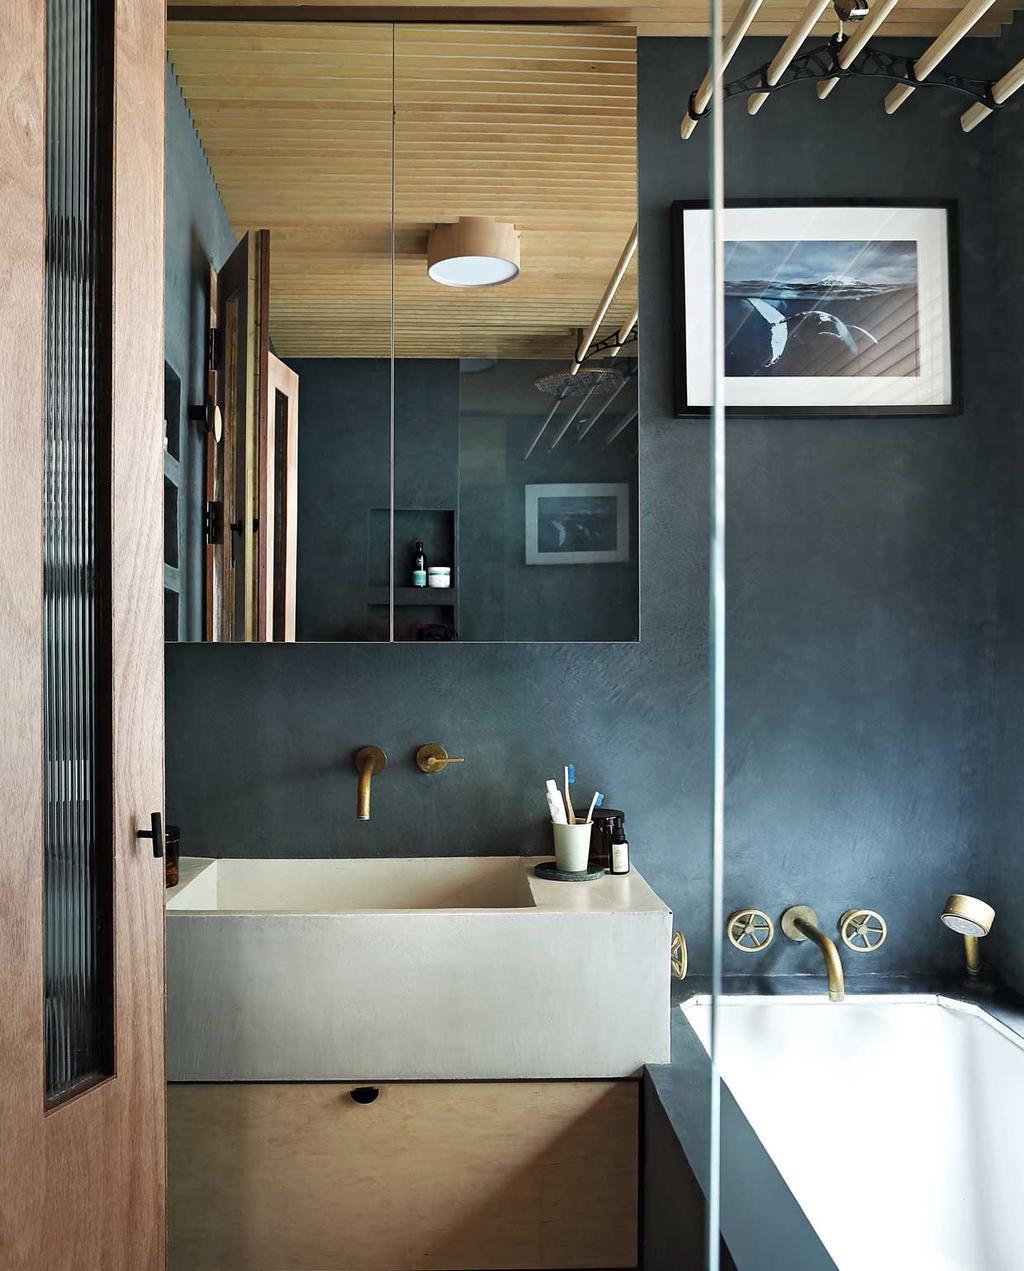 vtwonen bk special 03-2020 | knus londens familiehuis badkamer